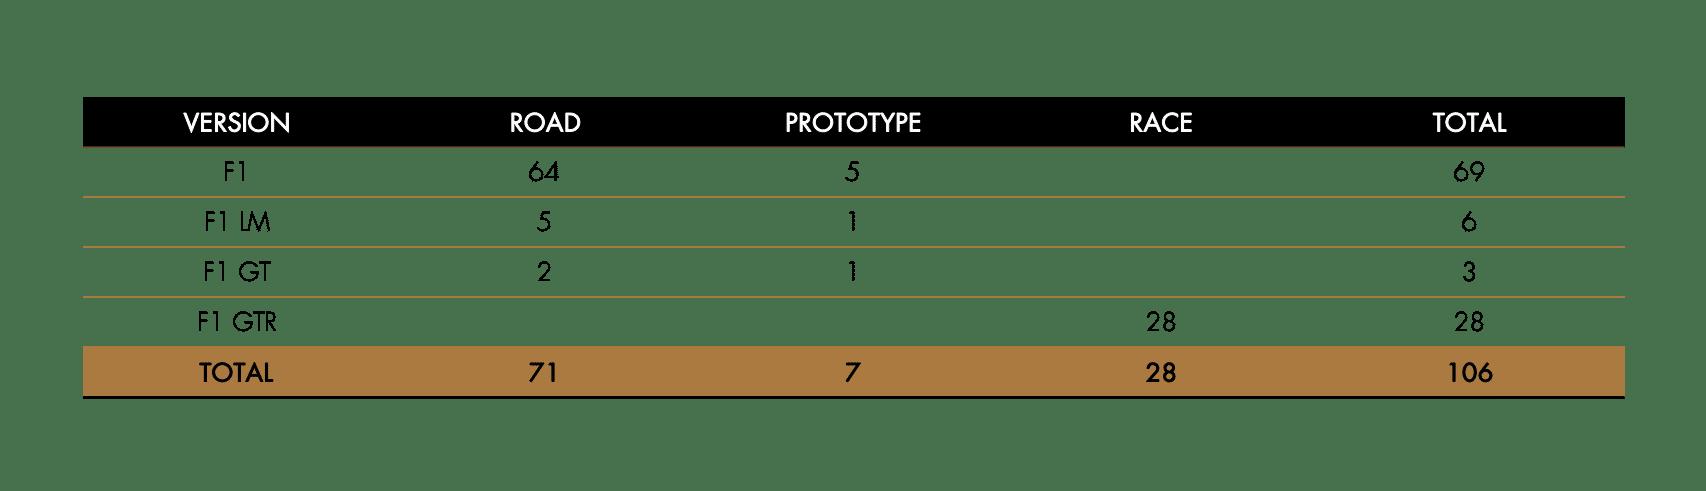 McLaren F1 Production Overview